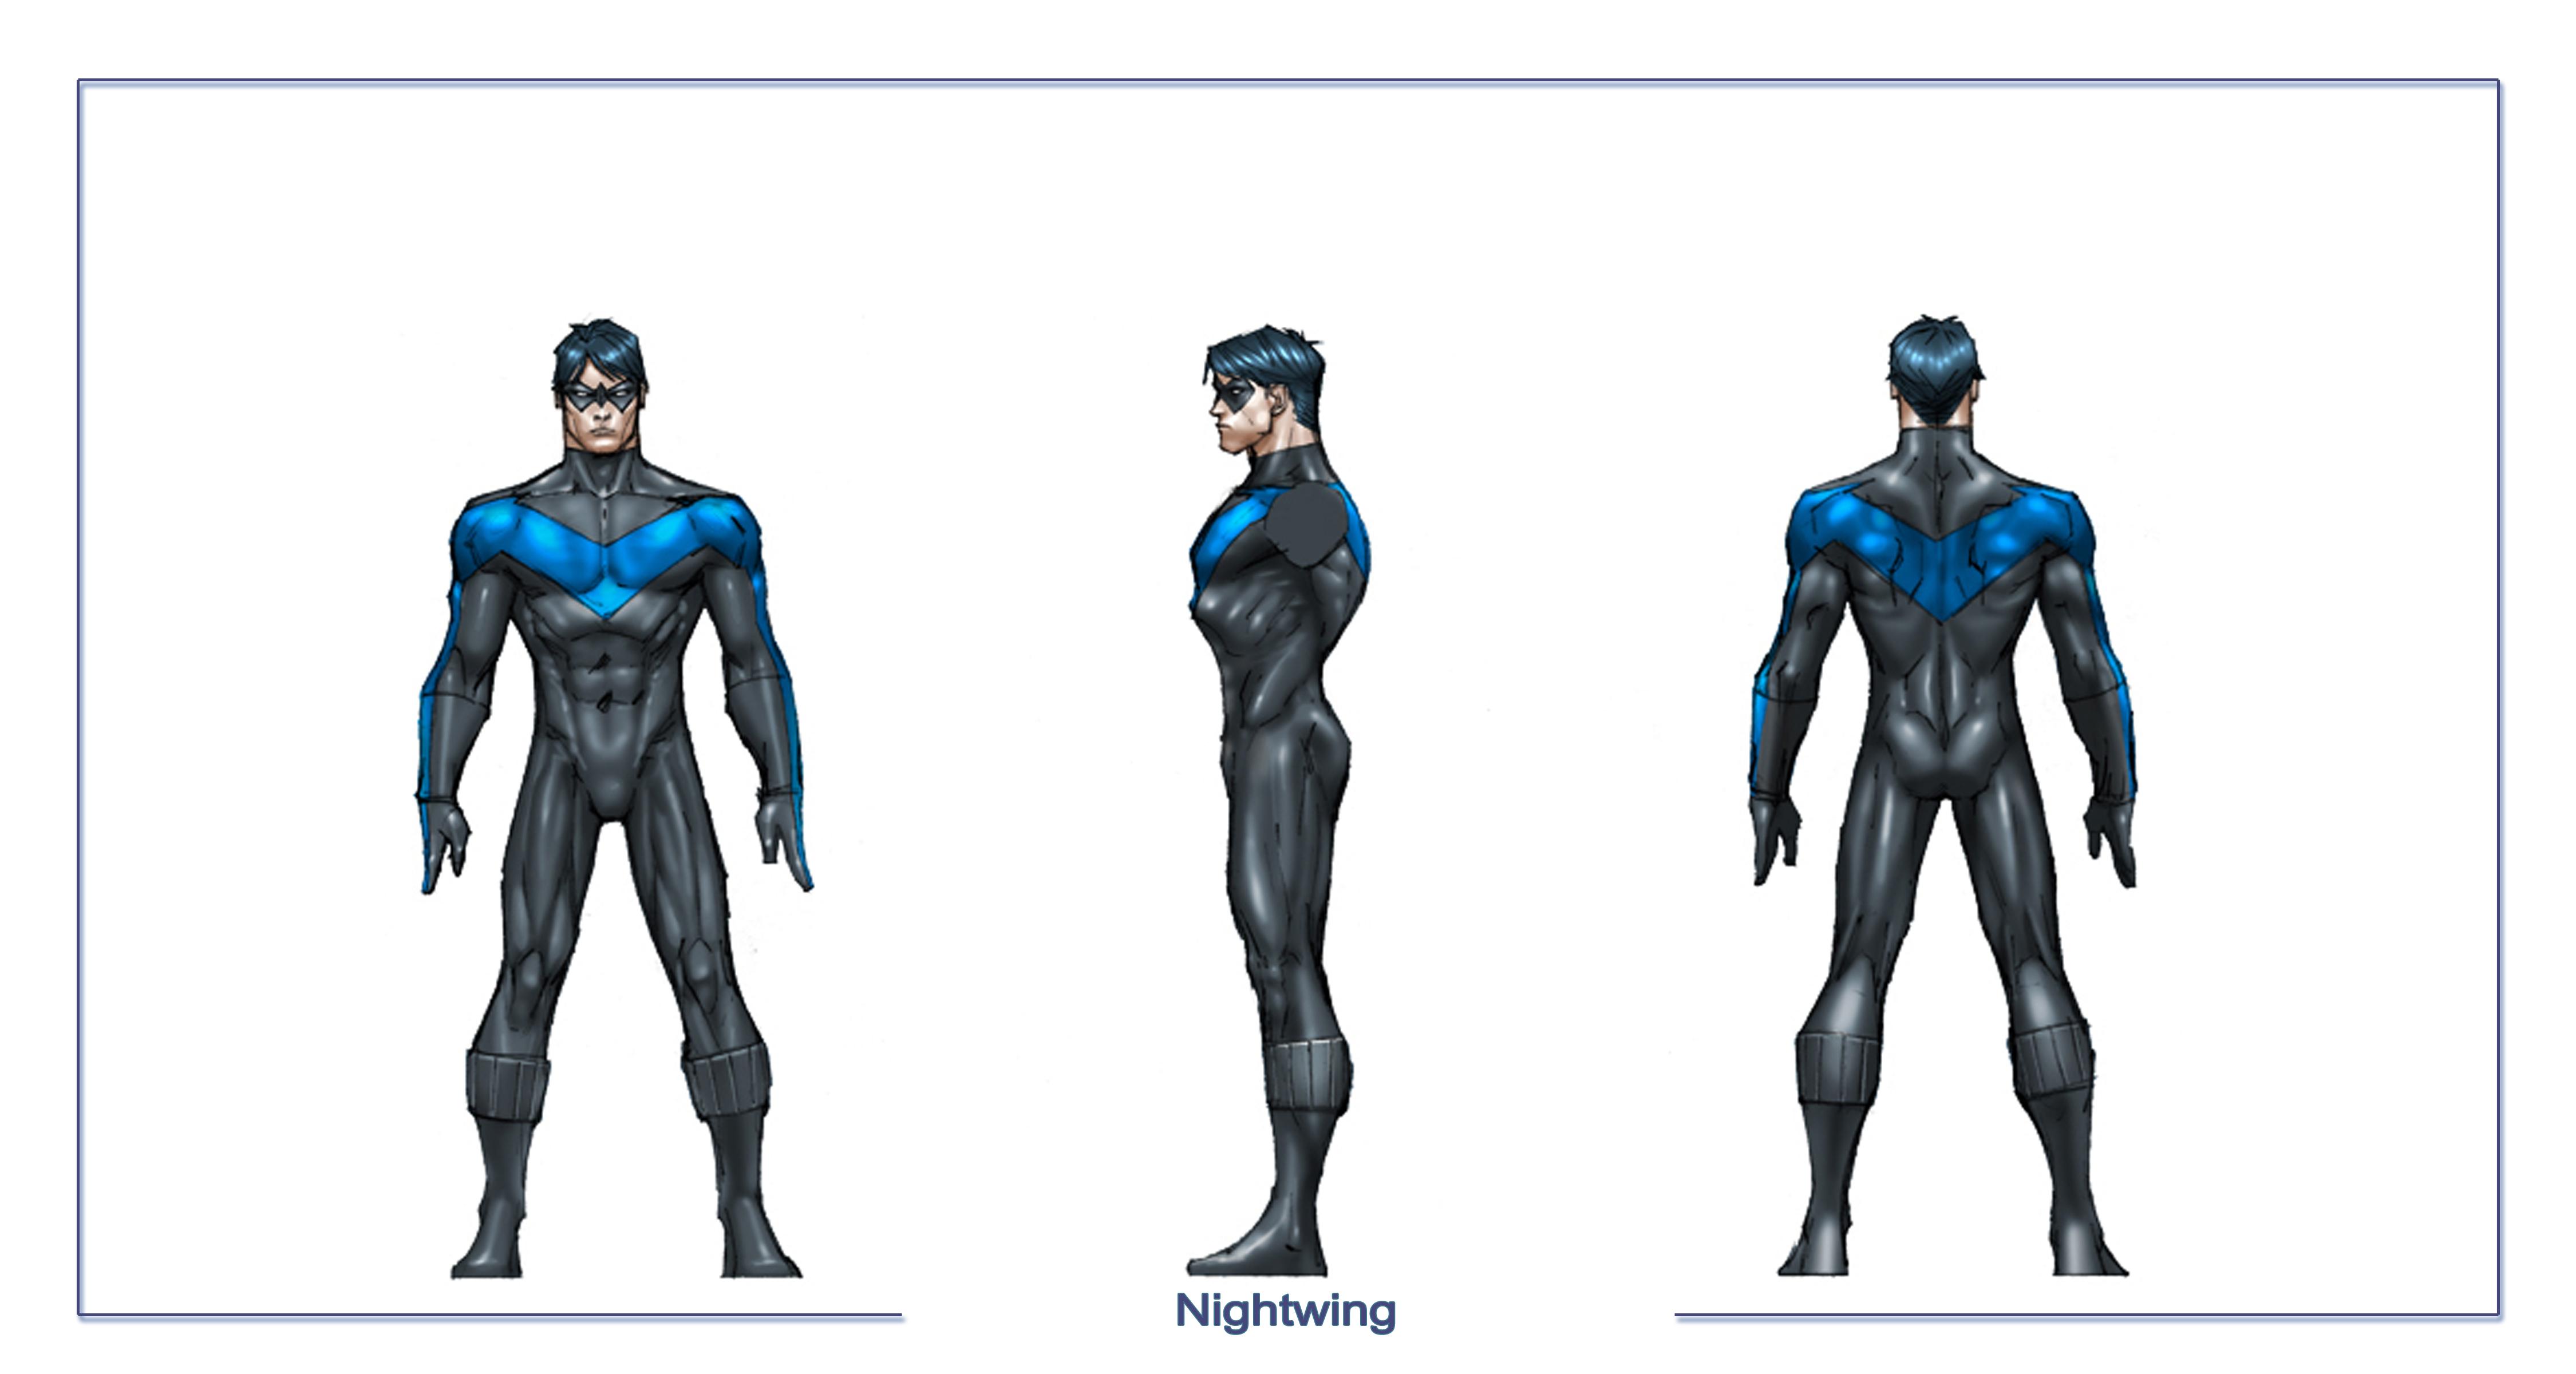 Nightwing Costume For Kids Nightwing body